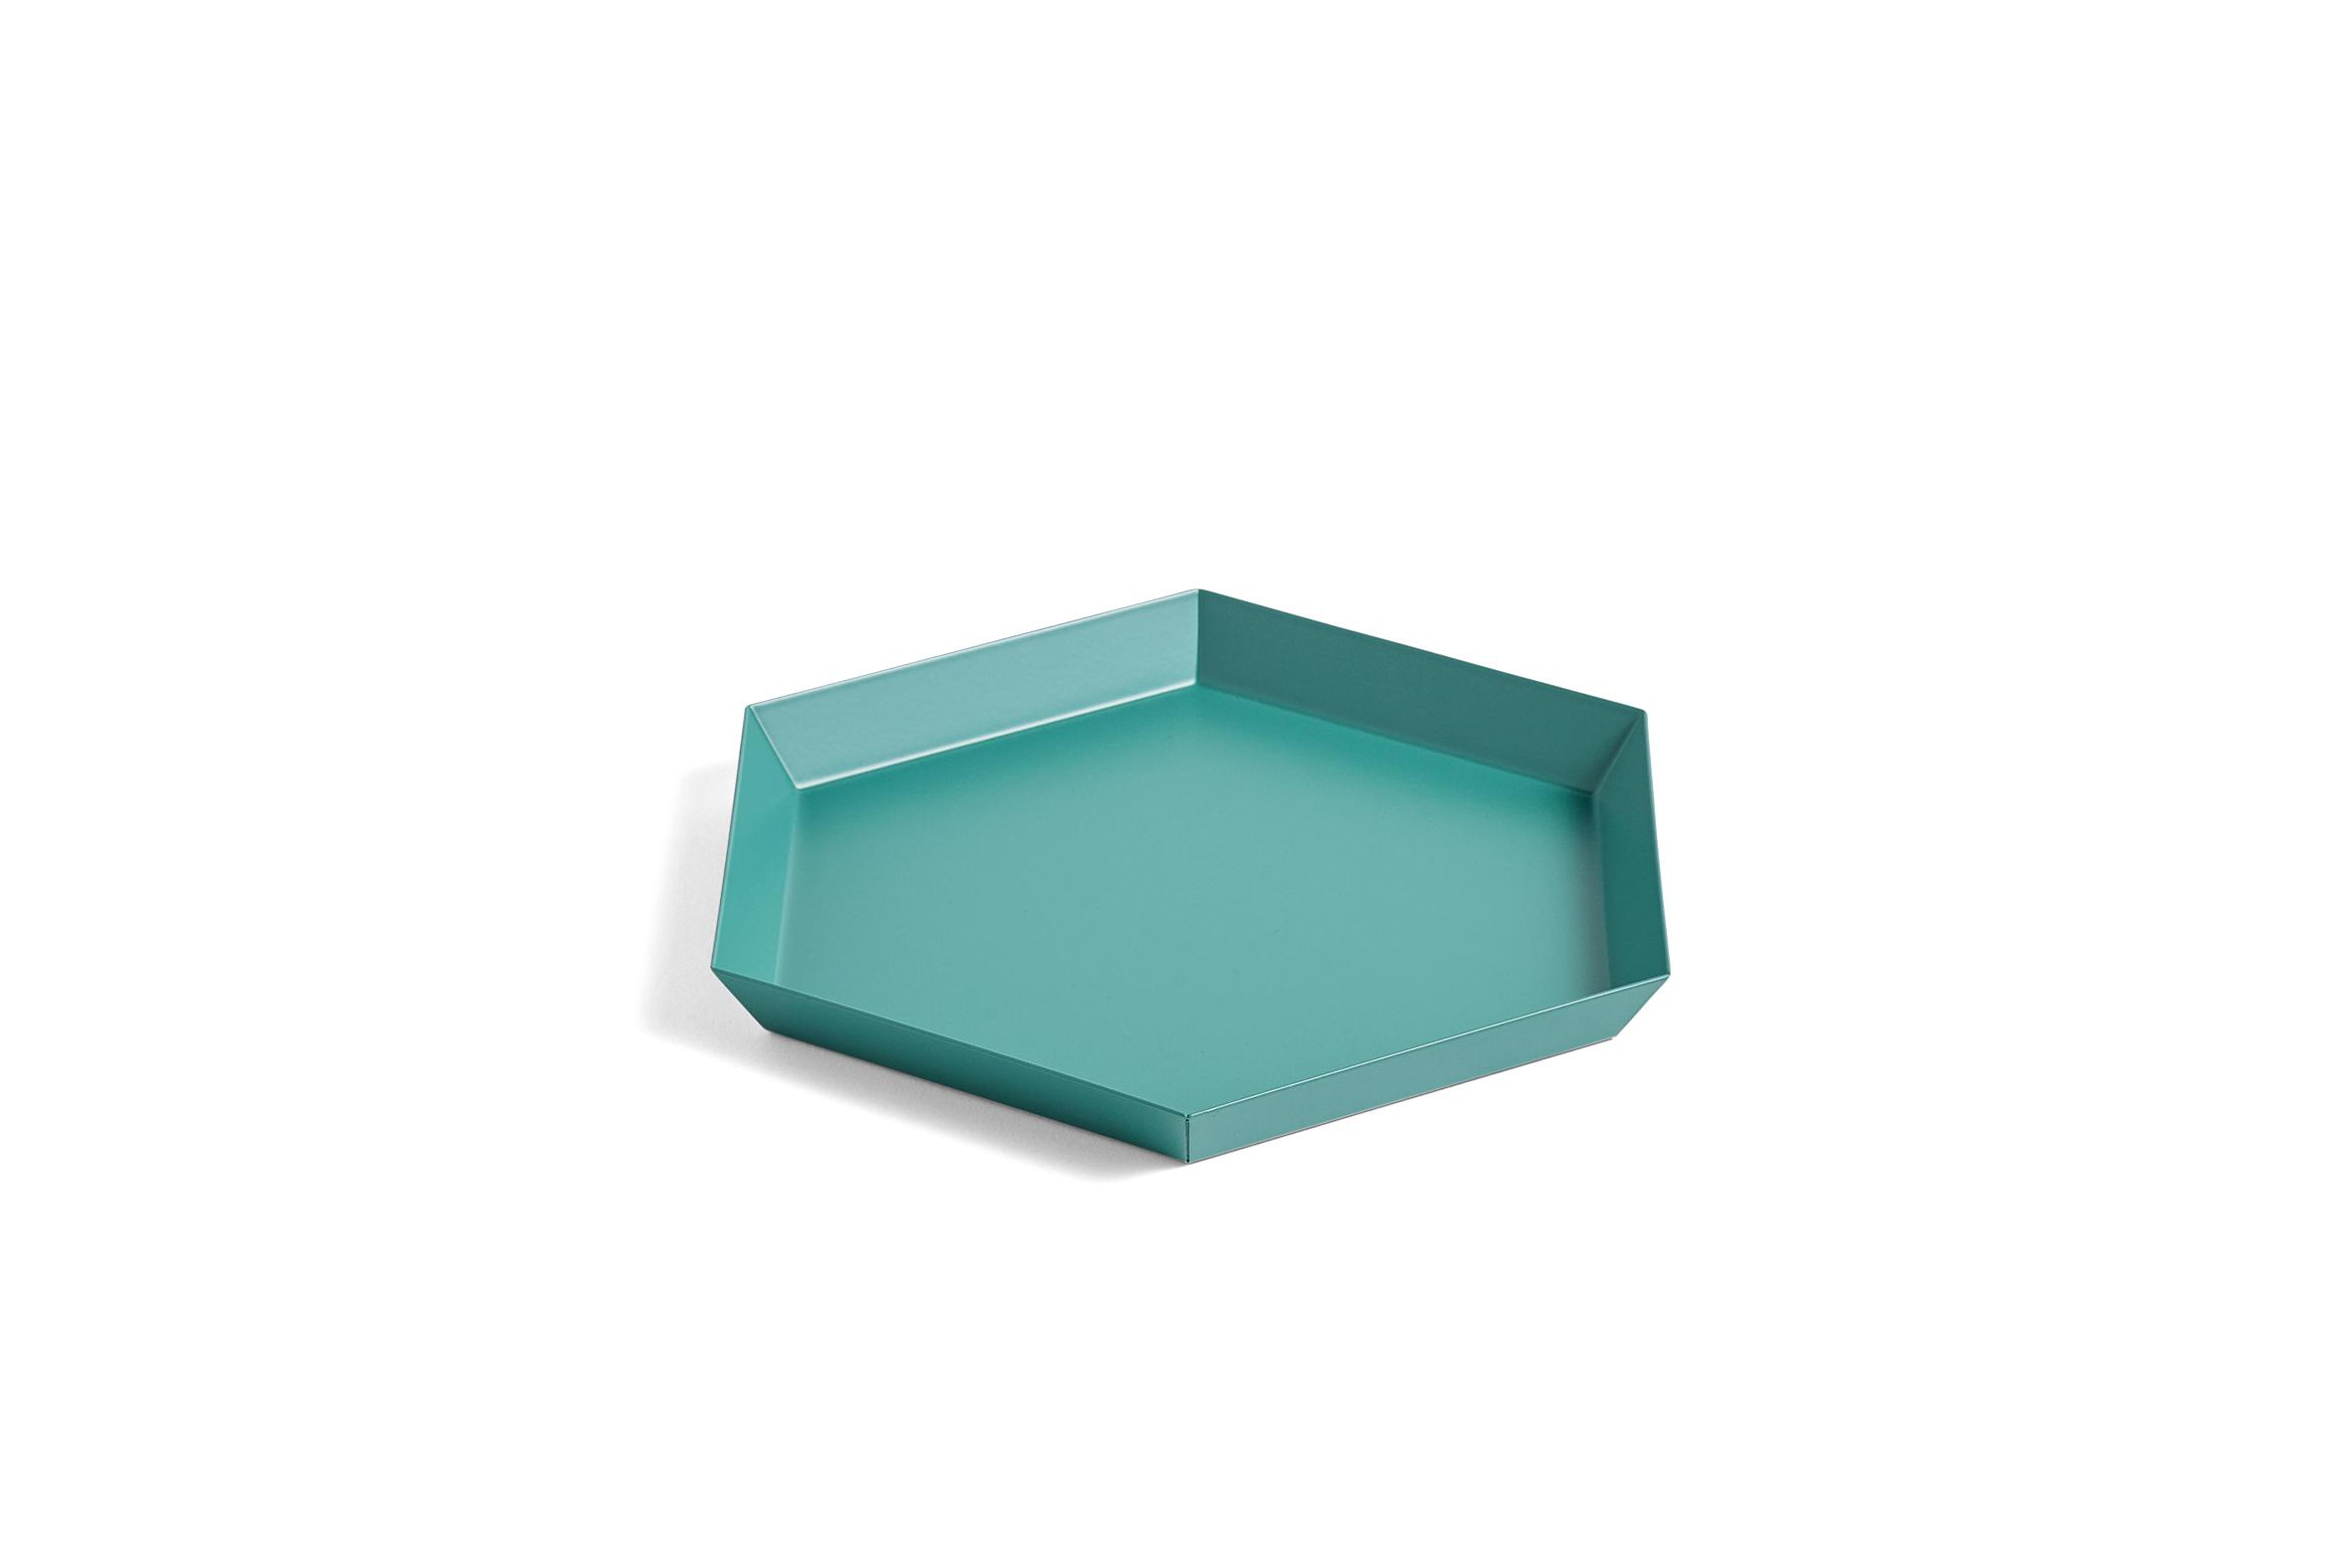 HAY - Kaleido Tray Small - Emerald Green (503936)